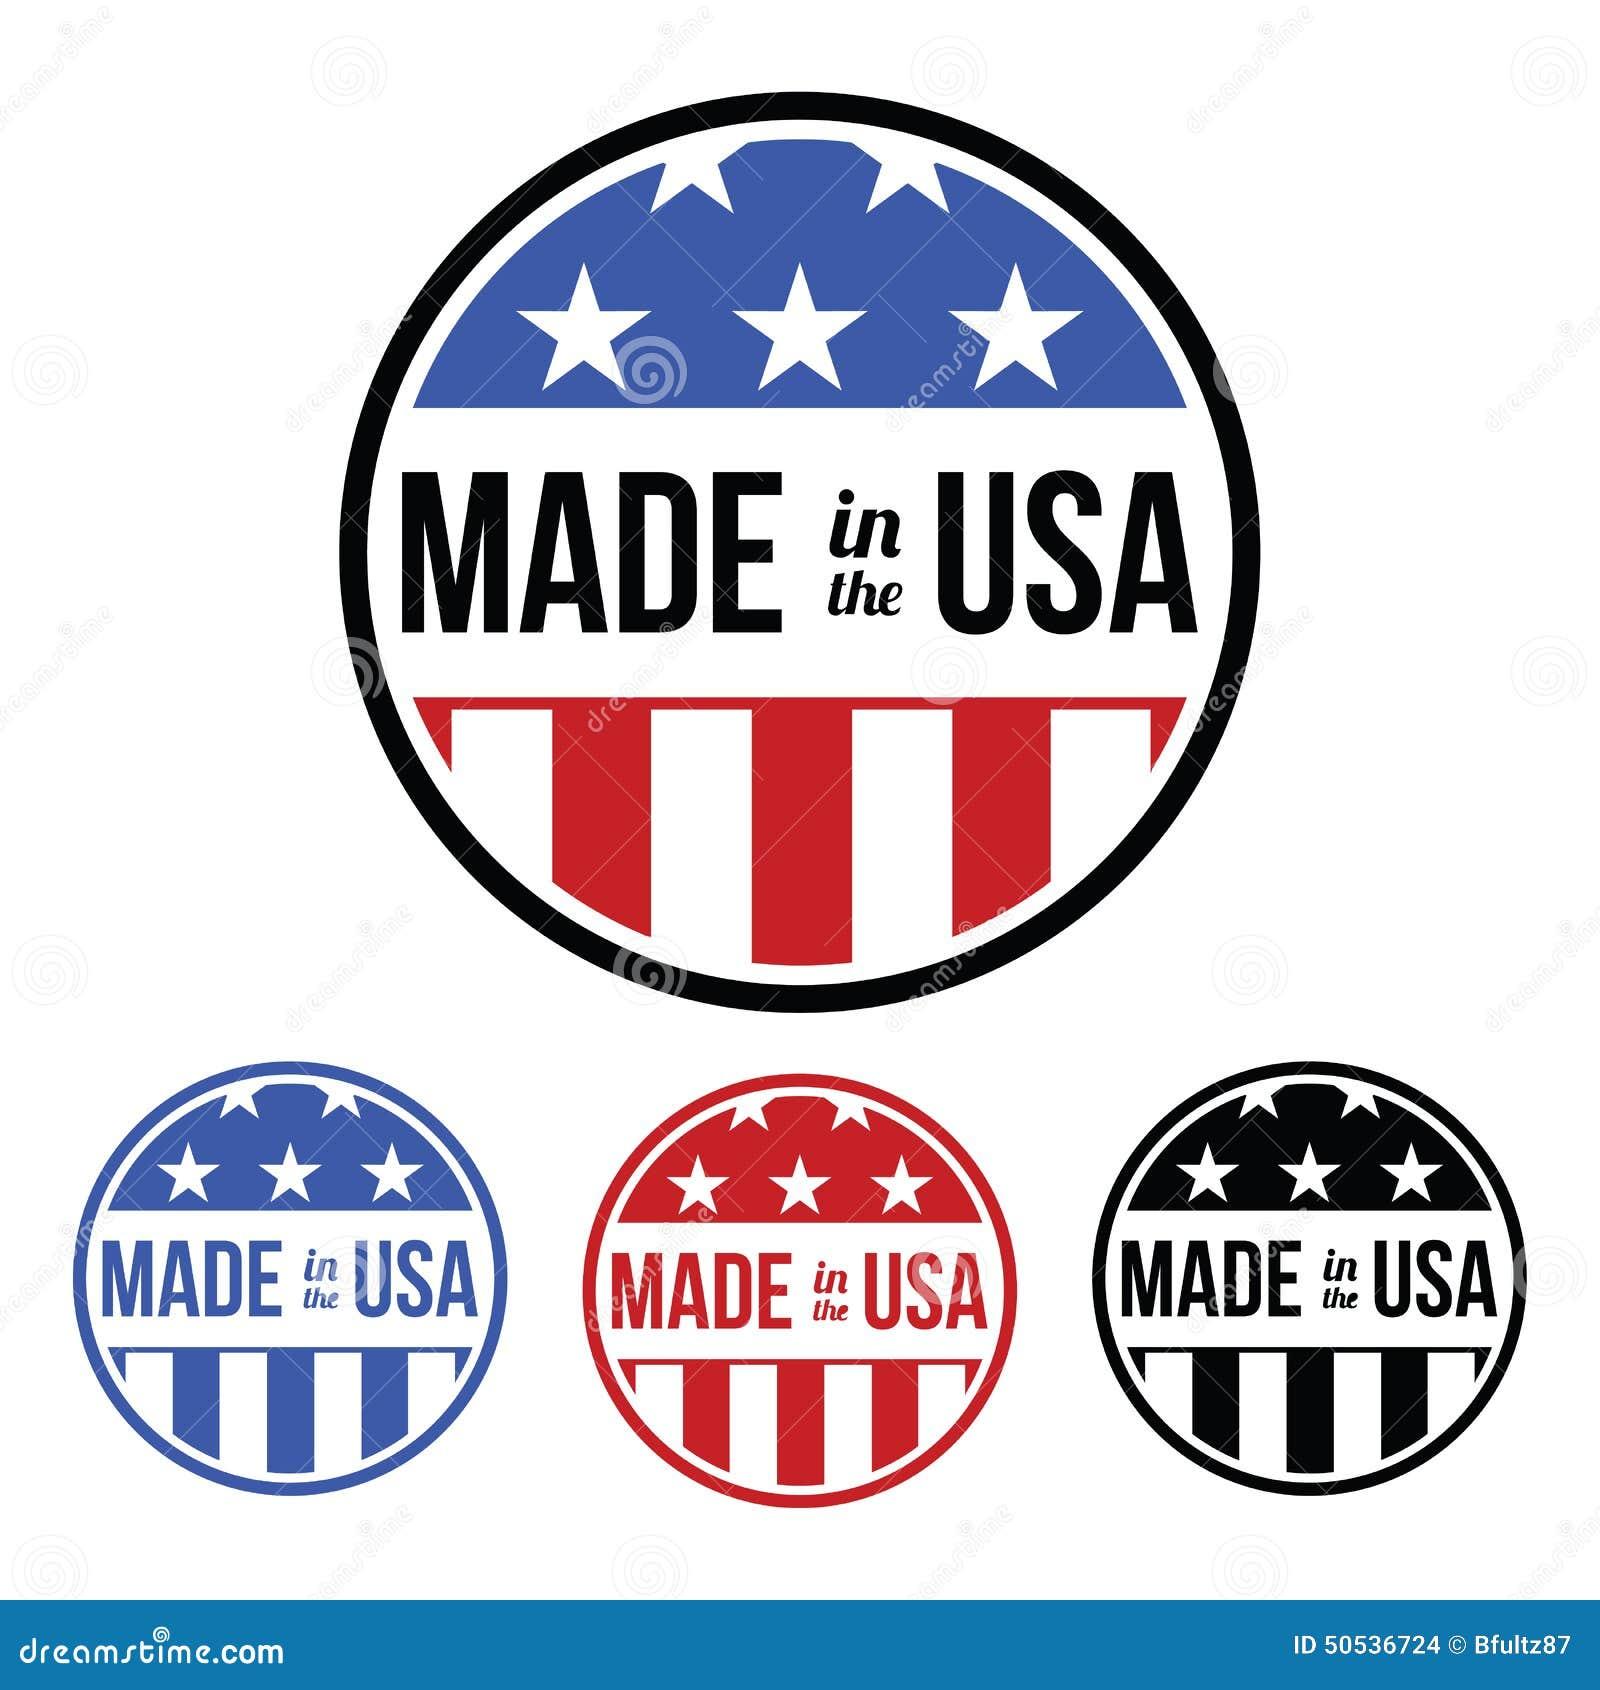 made in the usa symbol stock vector illustration of sticker 50536724. Black Bedroom Furniture Sets. Home Design Ideas